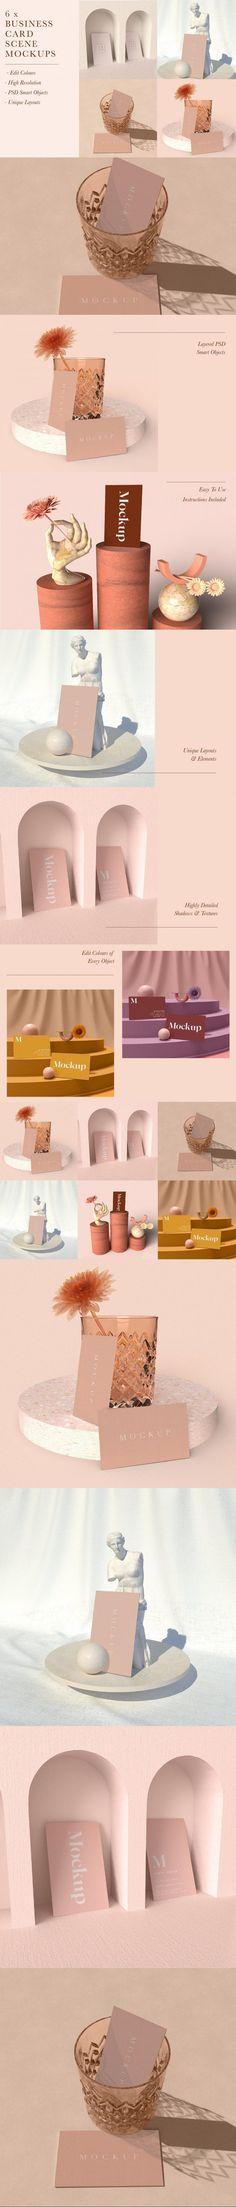 Chic Business Card Scene Mockups #psd #bundle #topview #flower #chaitea #wellness #lifestyle #yoga #statue #mockup #natural #template #portfolio #spread #mockups #mystical #mockups #patterns #TemplateDesign